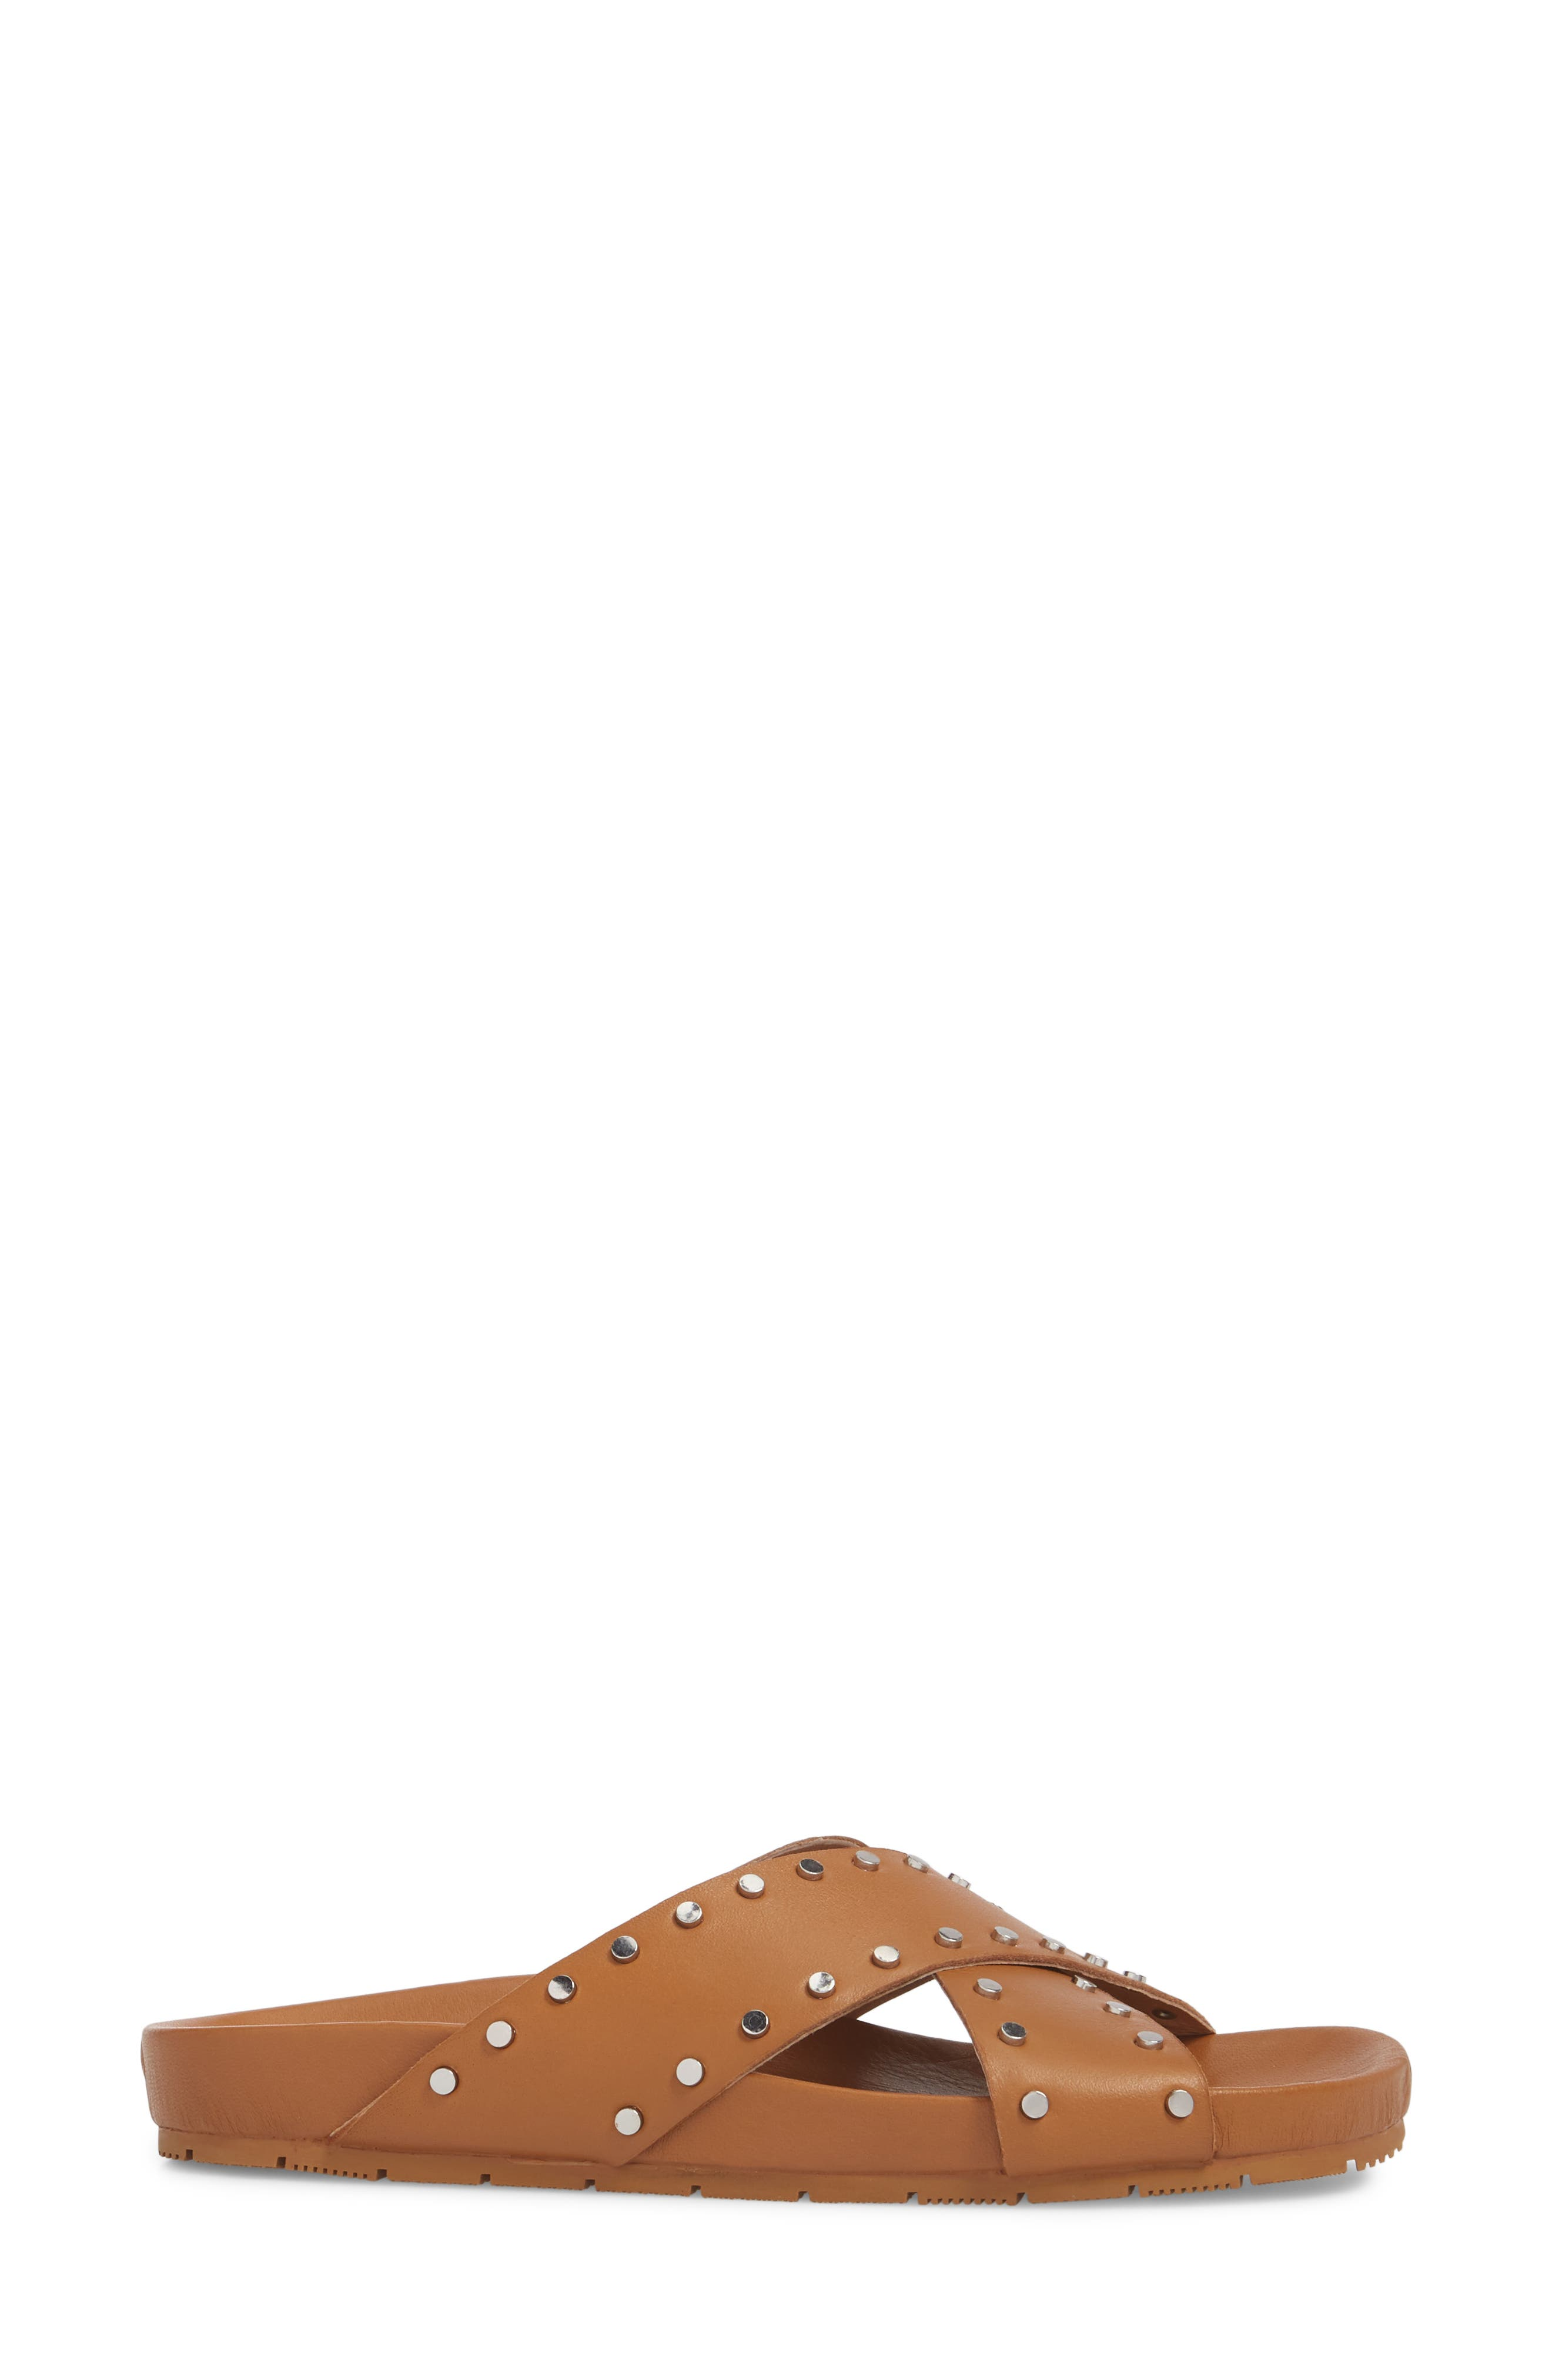 Ellie Studded Slide Sandal,                             Alternate thumbnail 3, color,                             Tan Leather